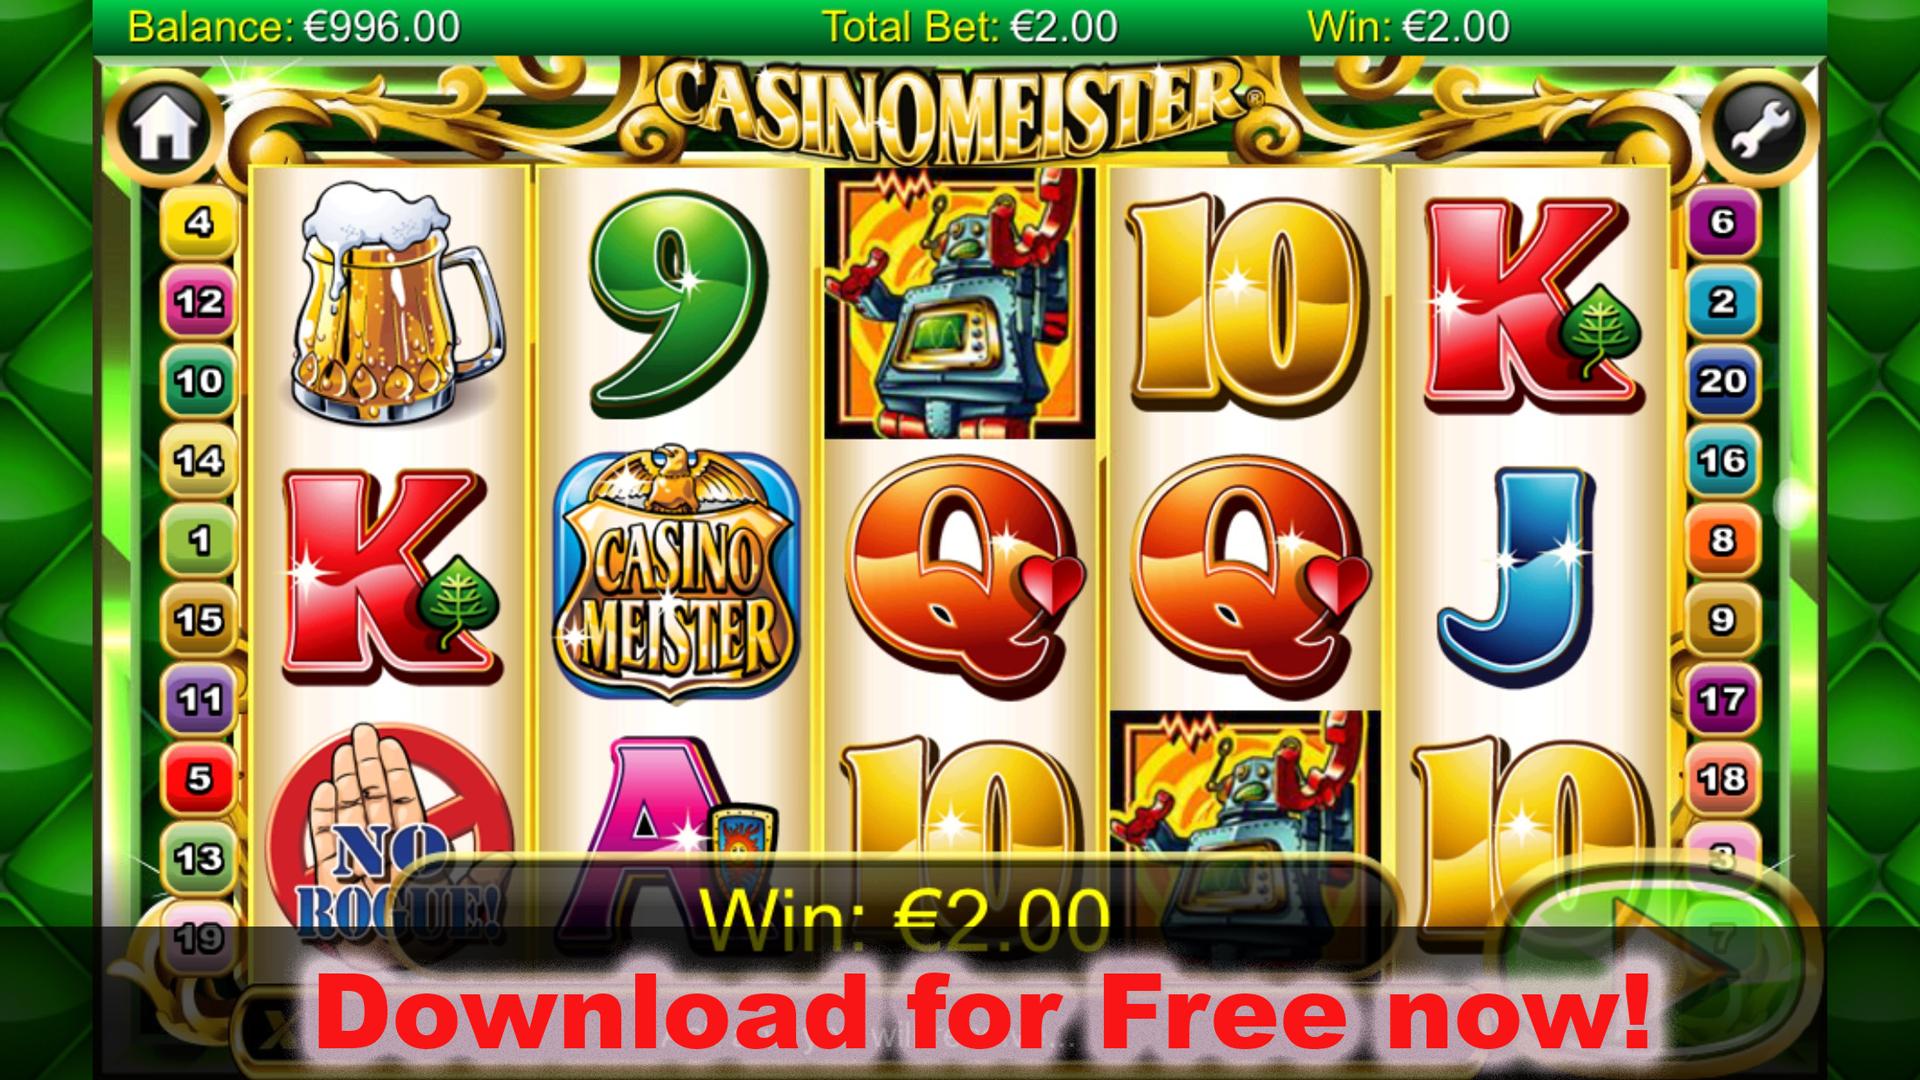 Prime slots casinomeister acer chromebook 13 sd card slot